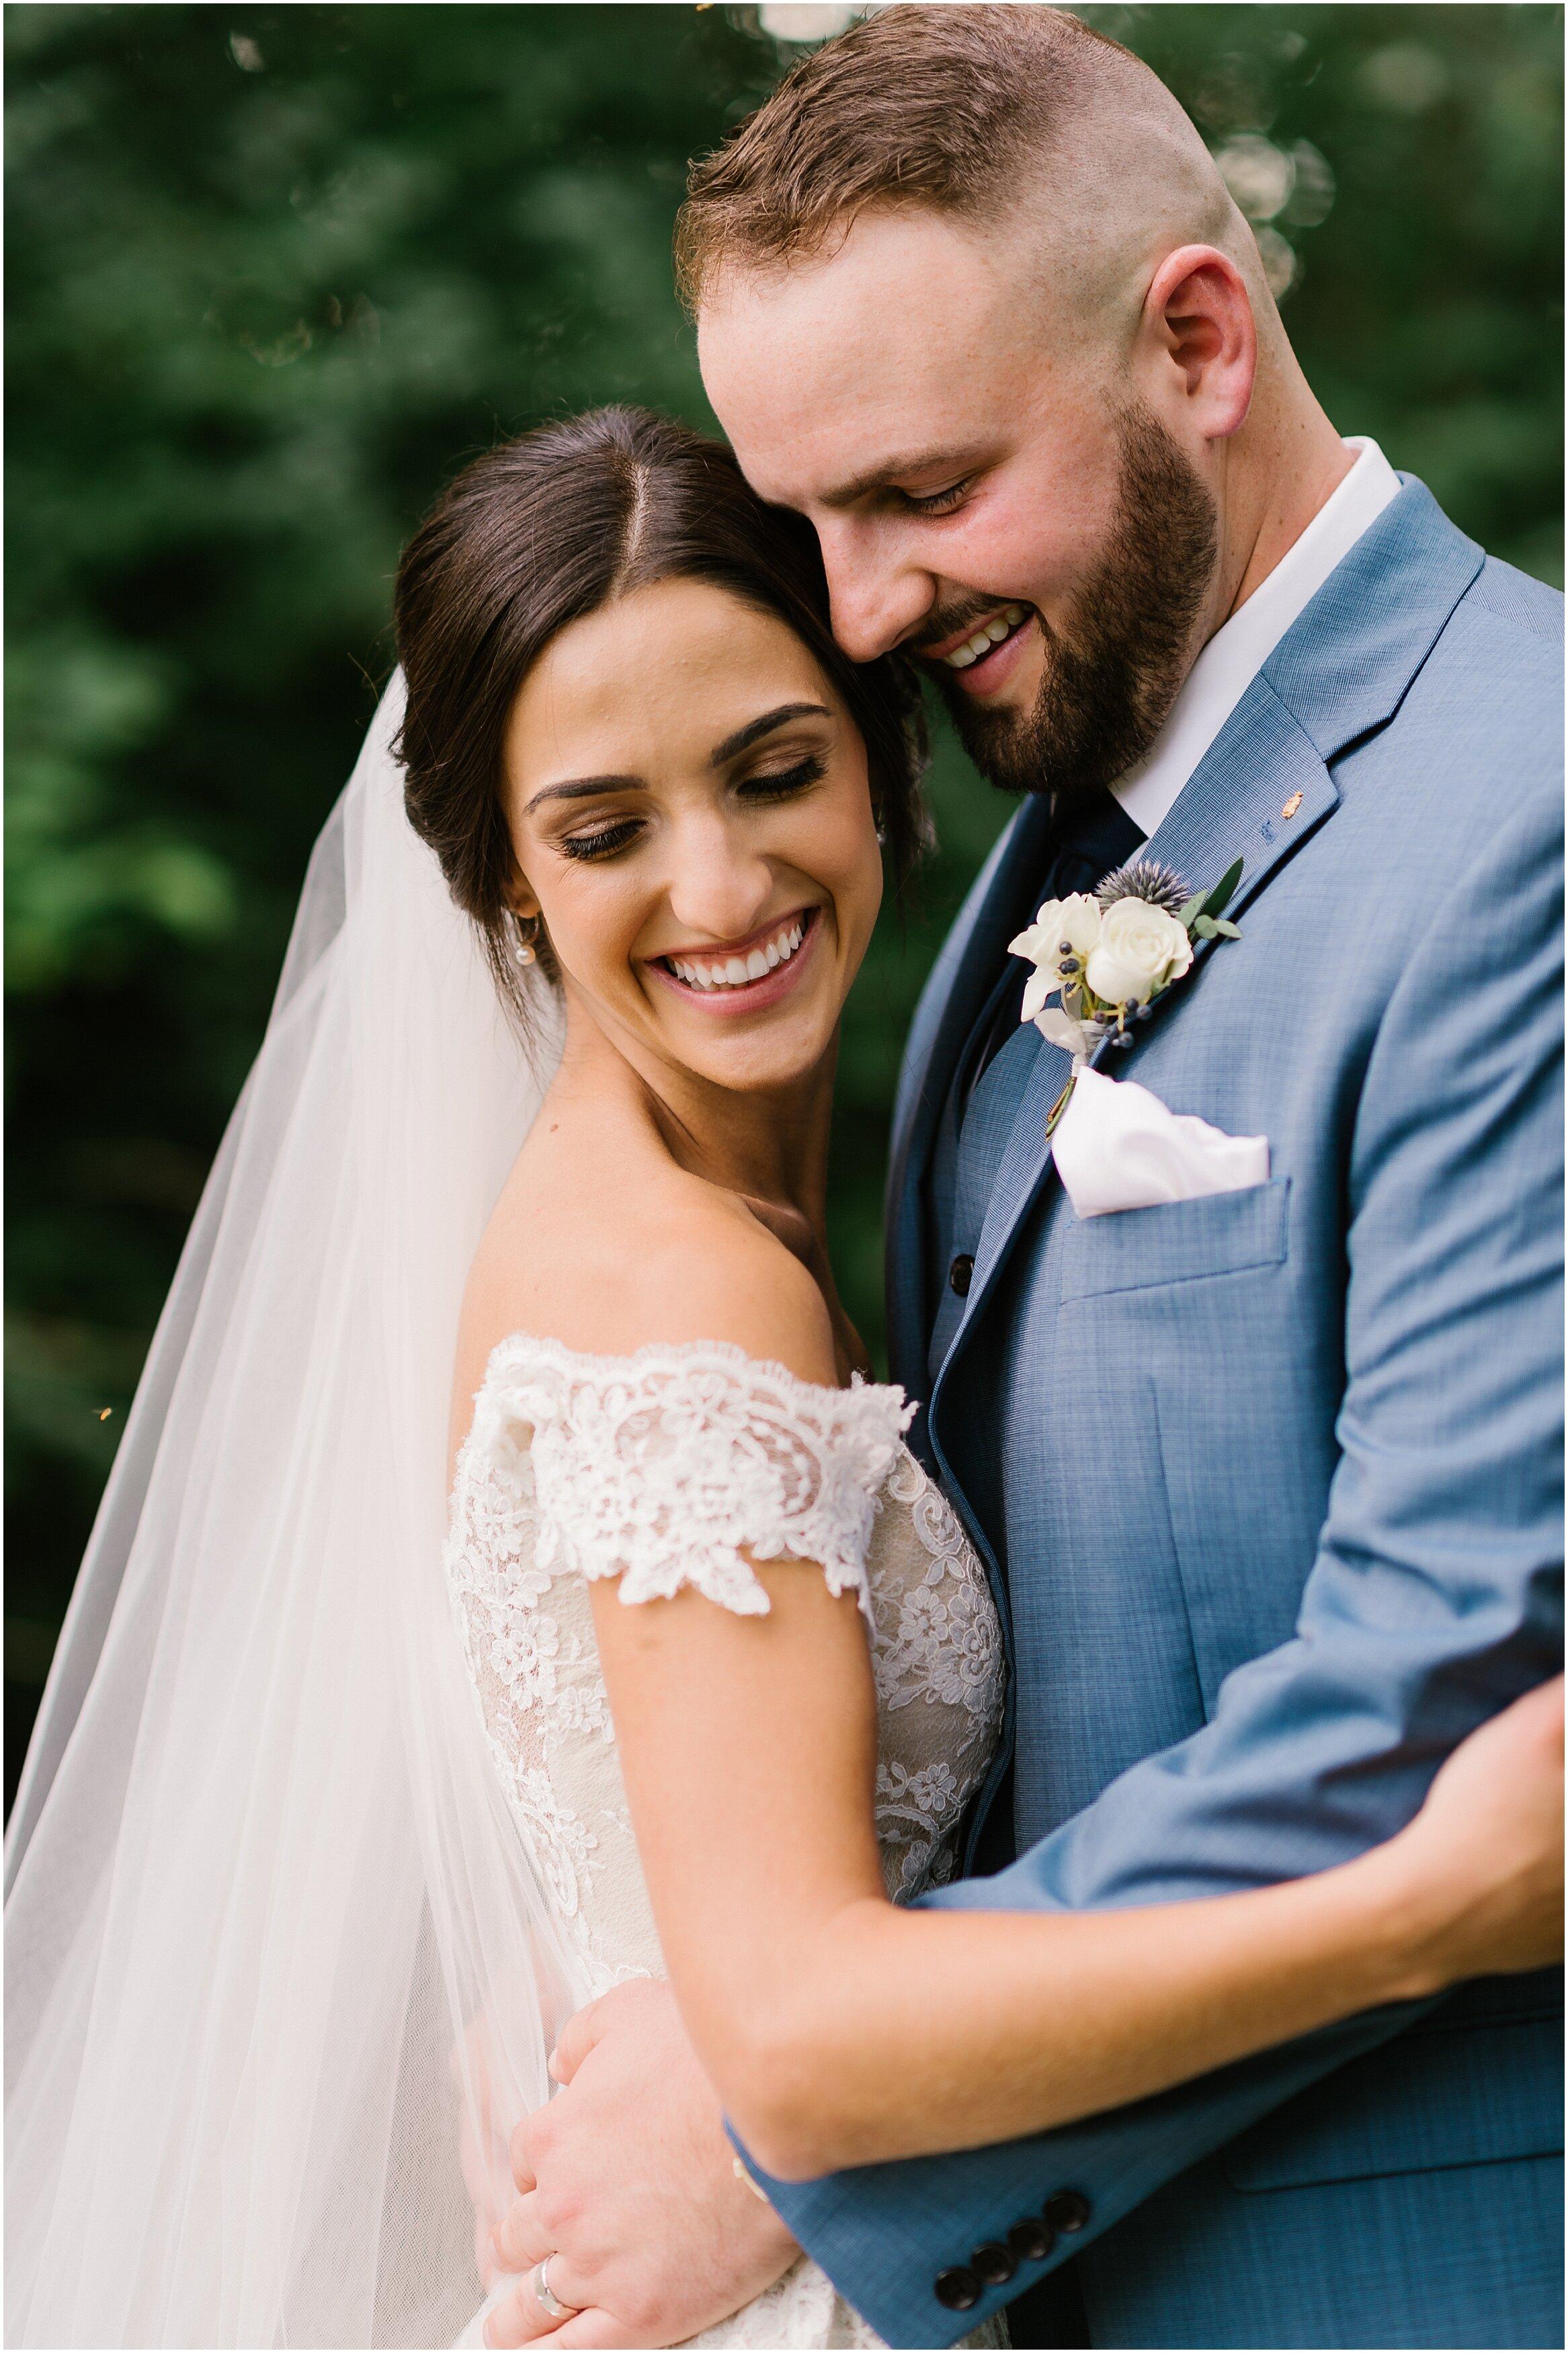 Rebecca Shehorn Photography Indianapolis Wedding Photographer Sycamore at Mallow Run_0755.jpg